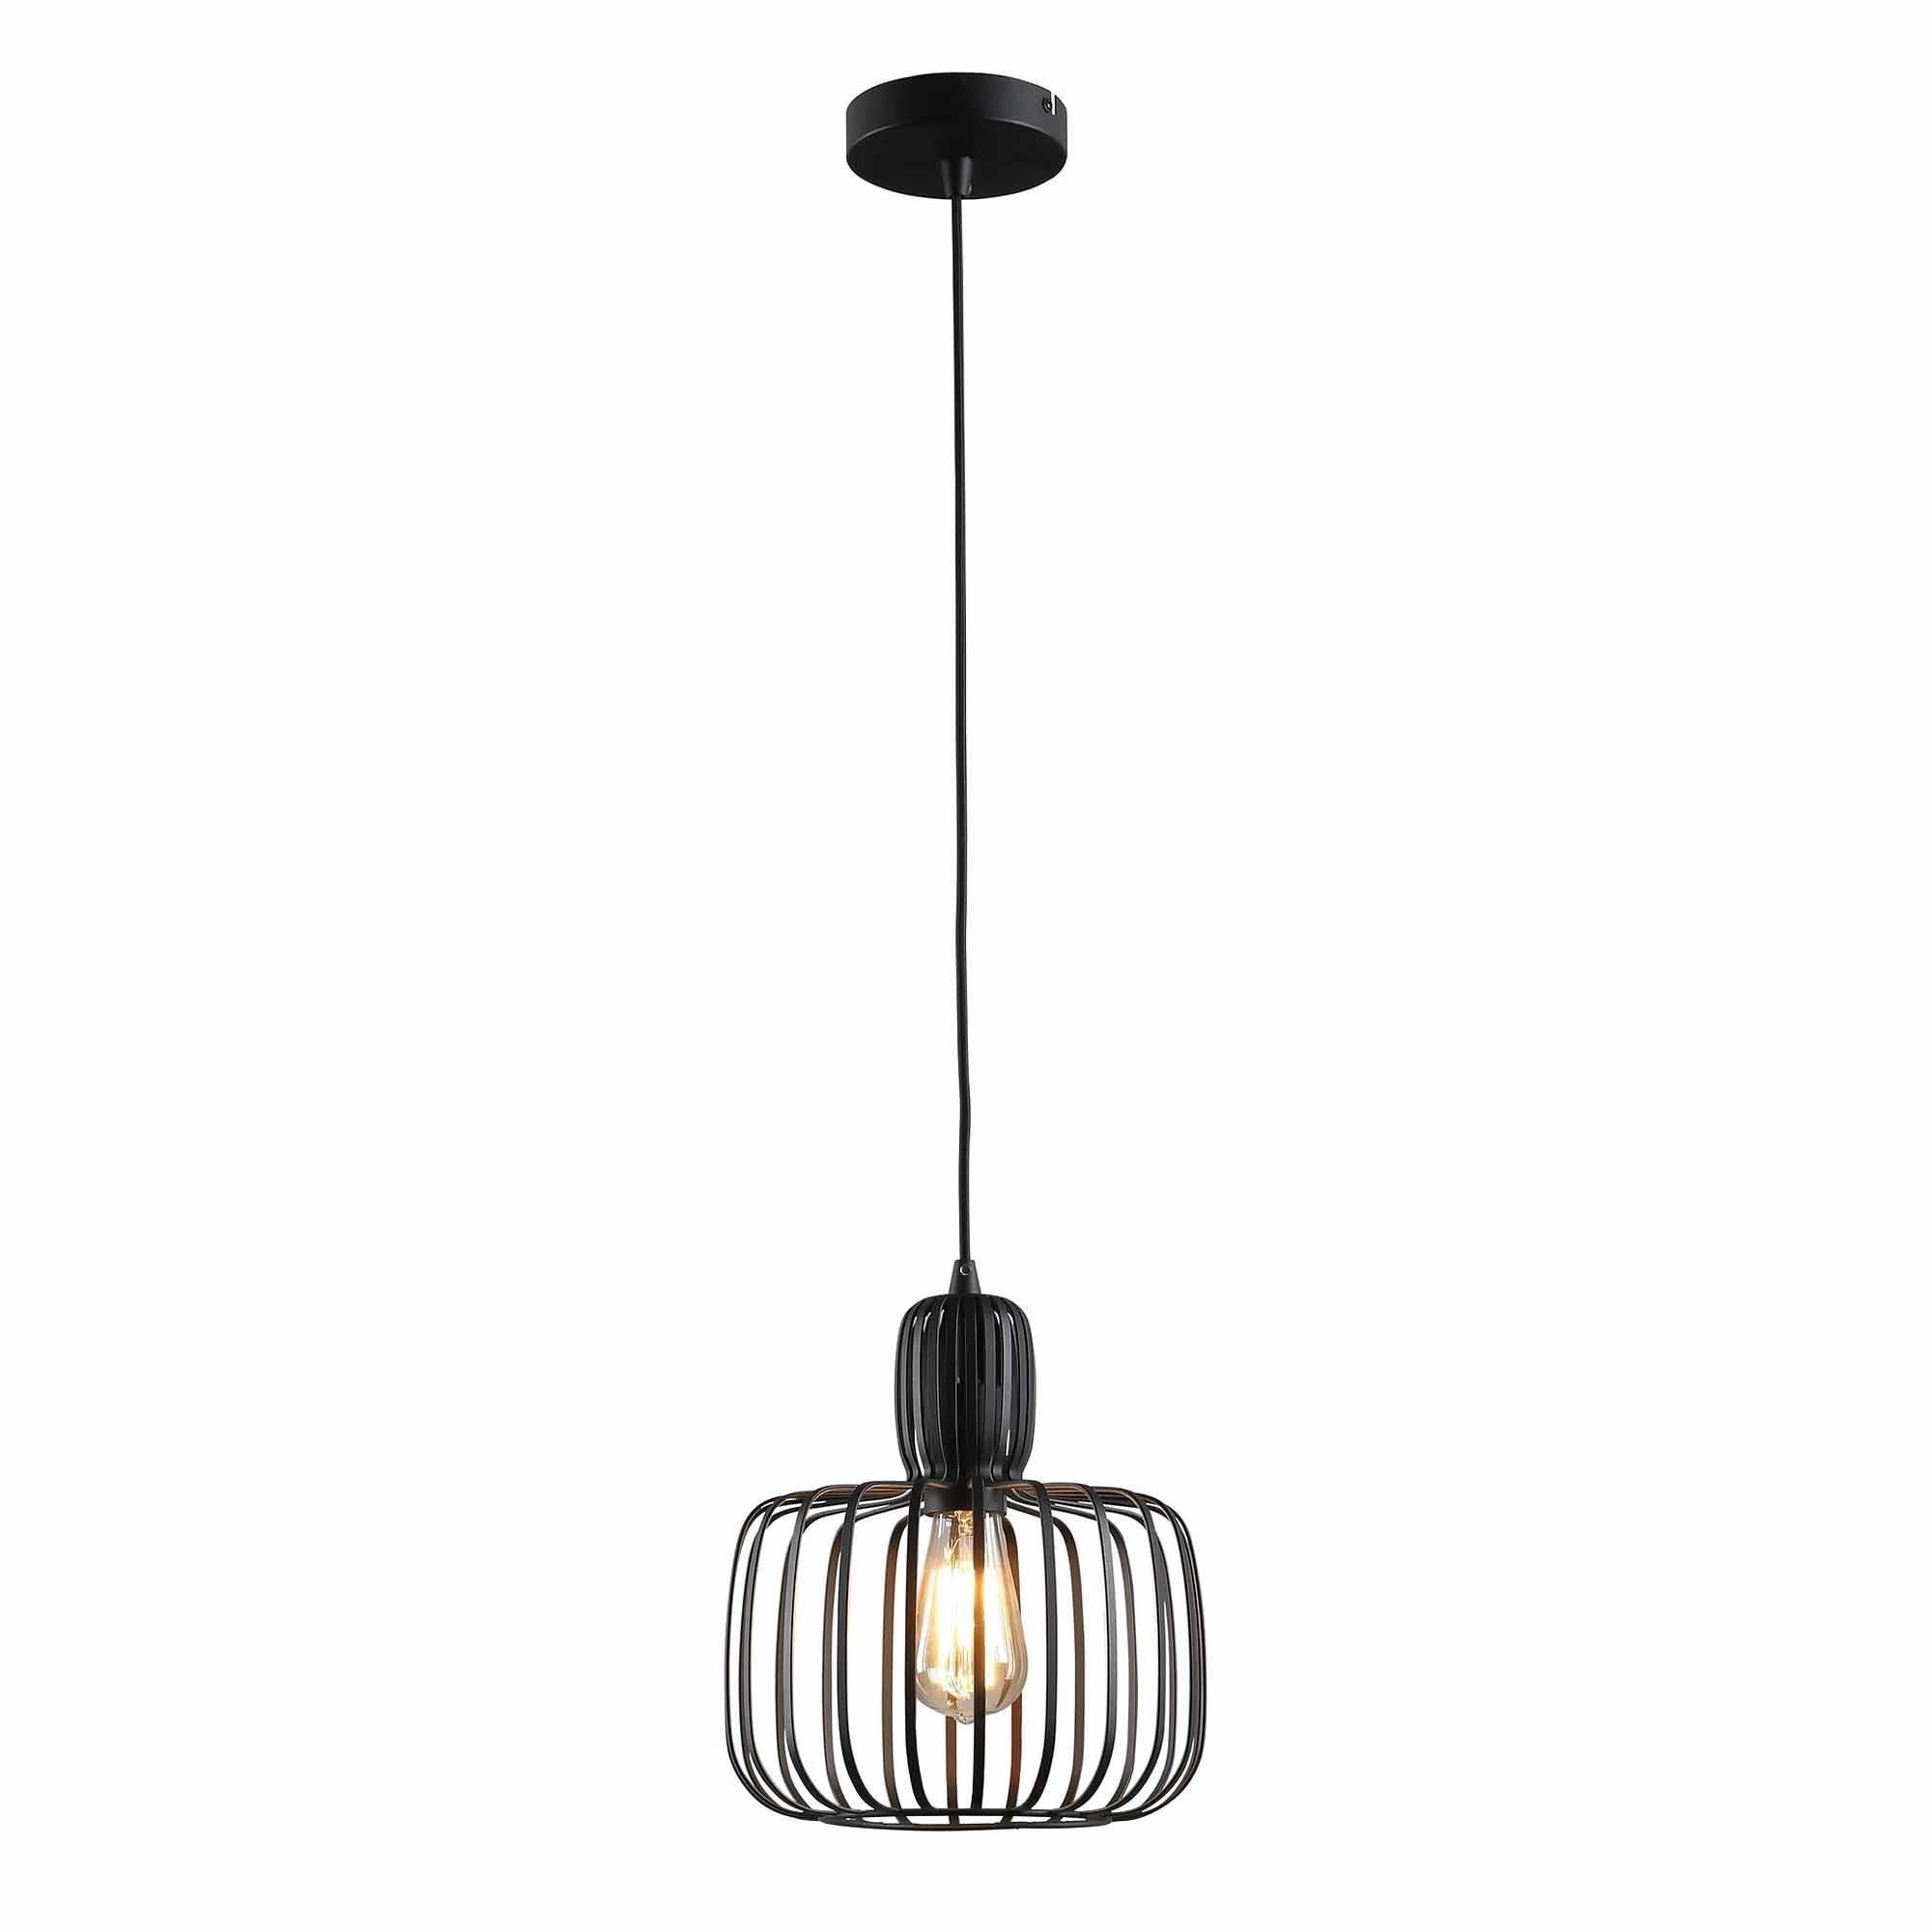 Freelight Hanglamp Costola Ø 25 cm zwart